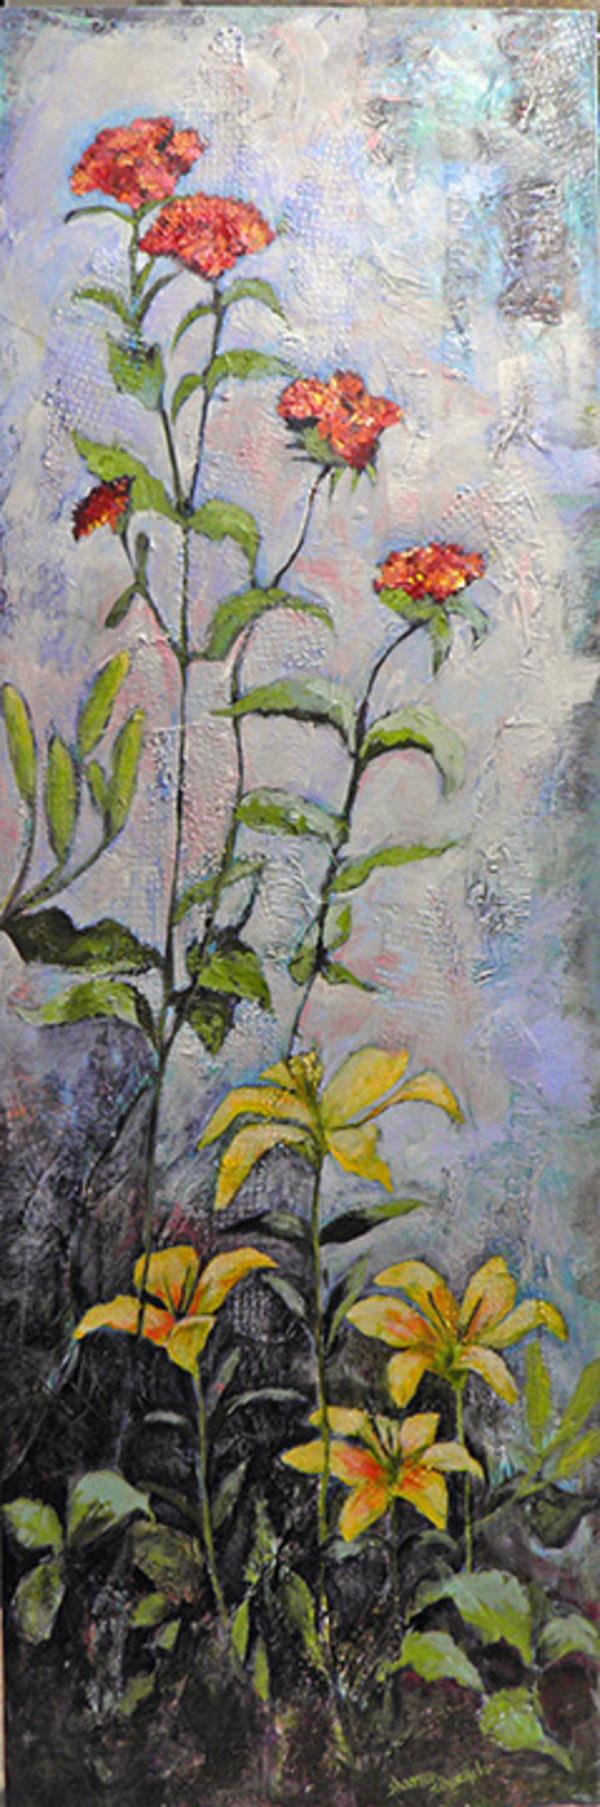 A Patch of The Pause Garden by Sharron Schoenfeld